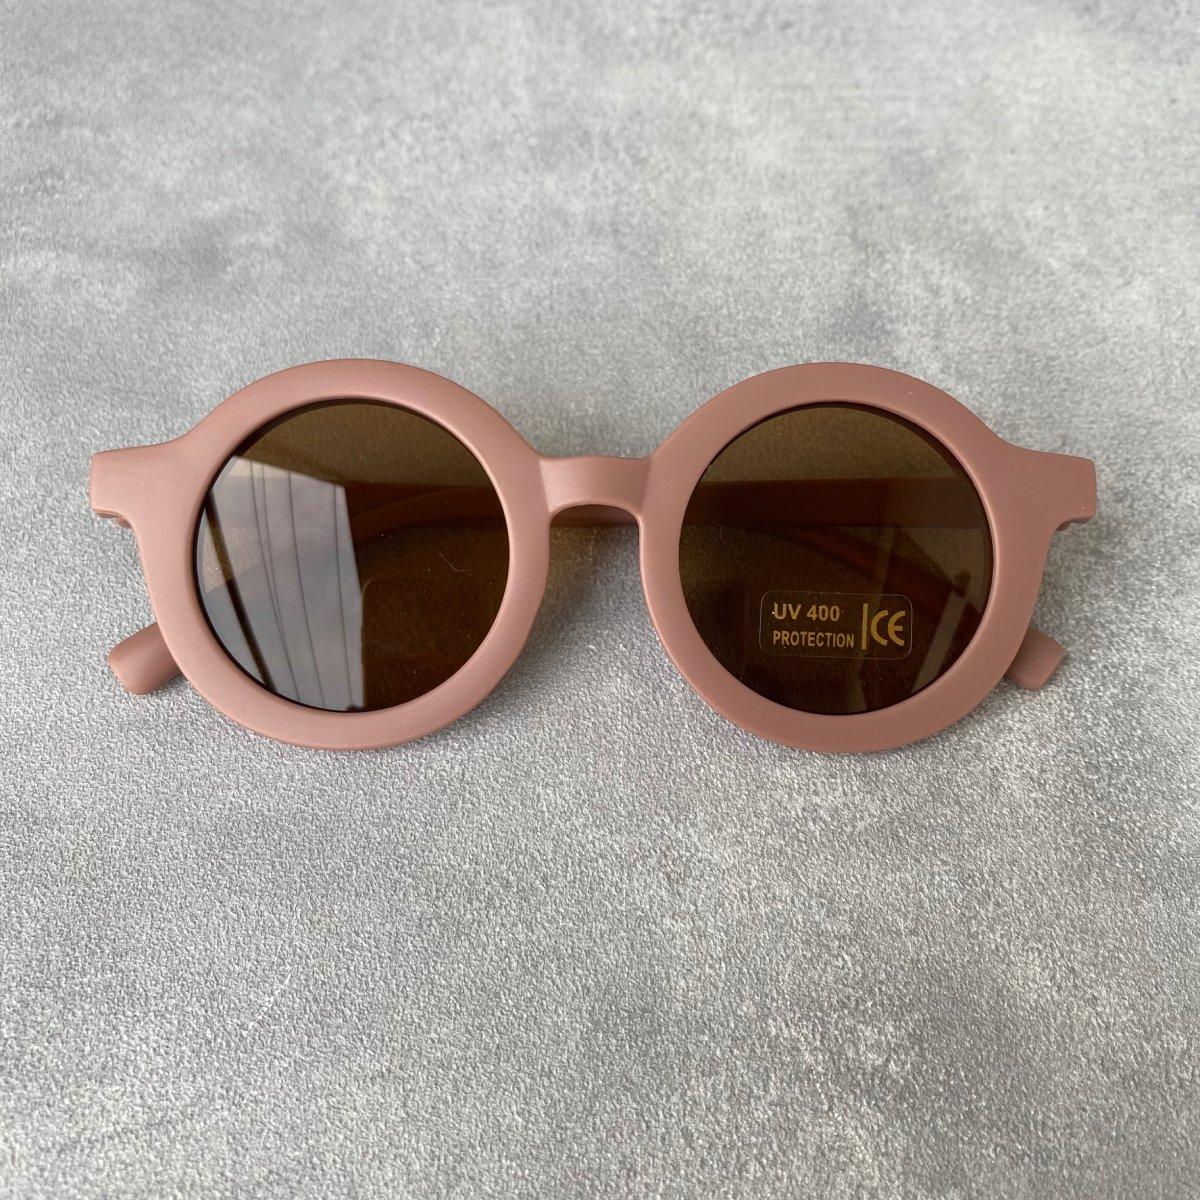 【KIDS】Kids Colorful Sunglasses 詳細画像3